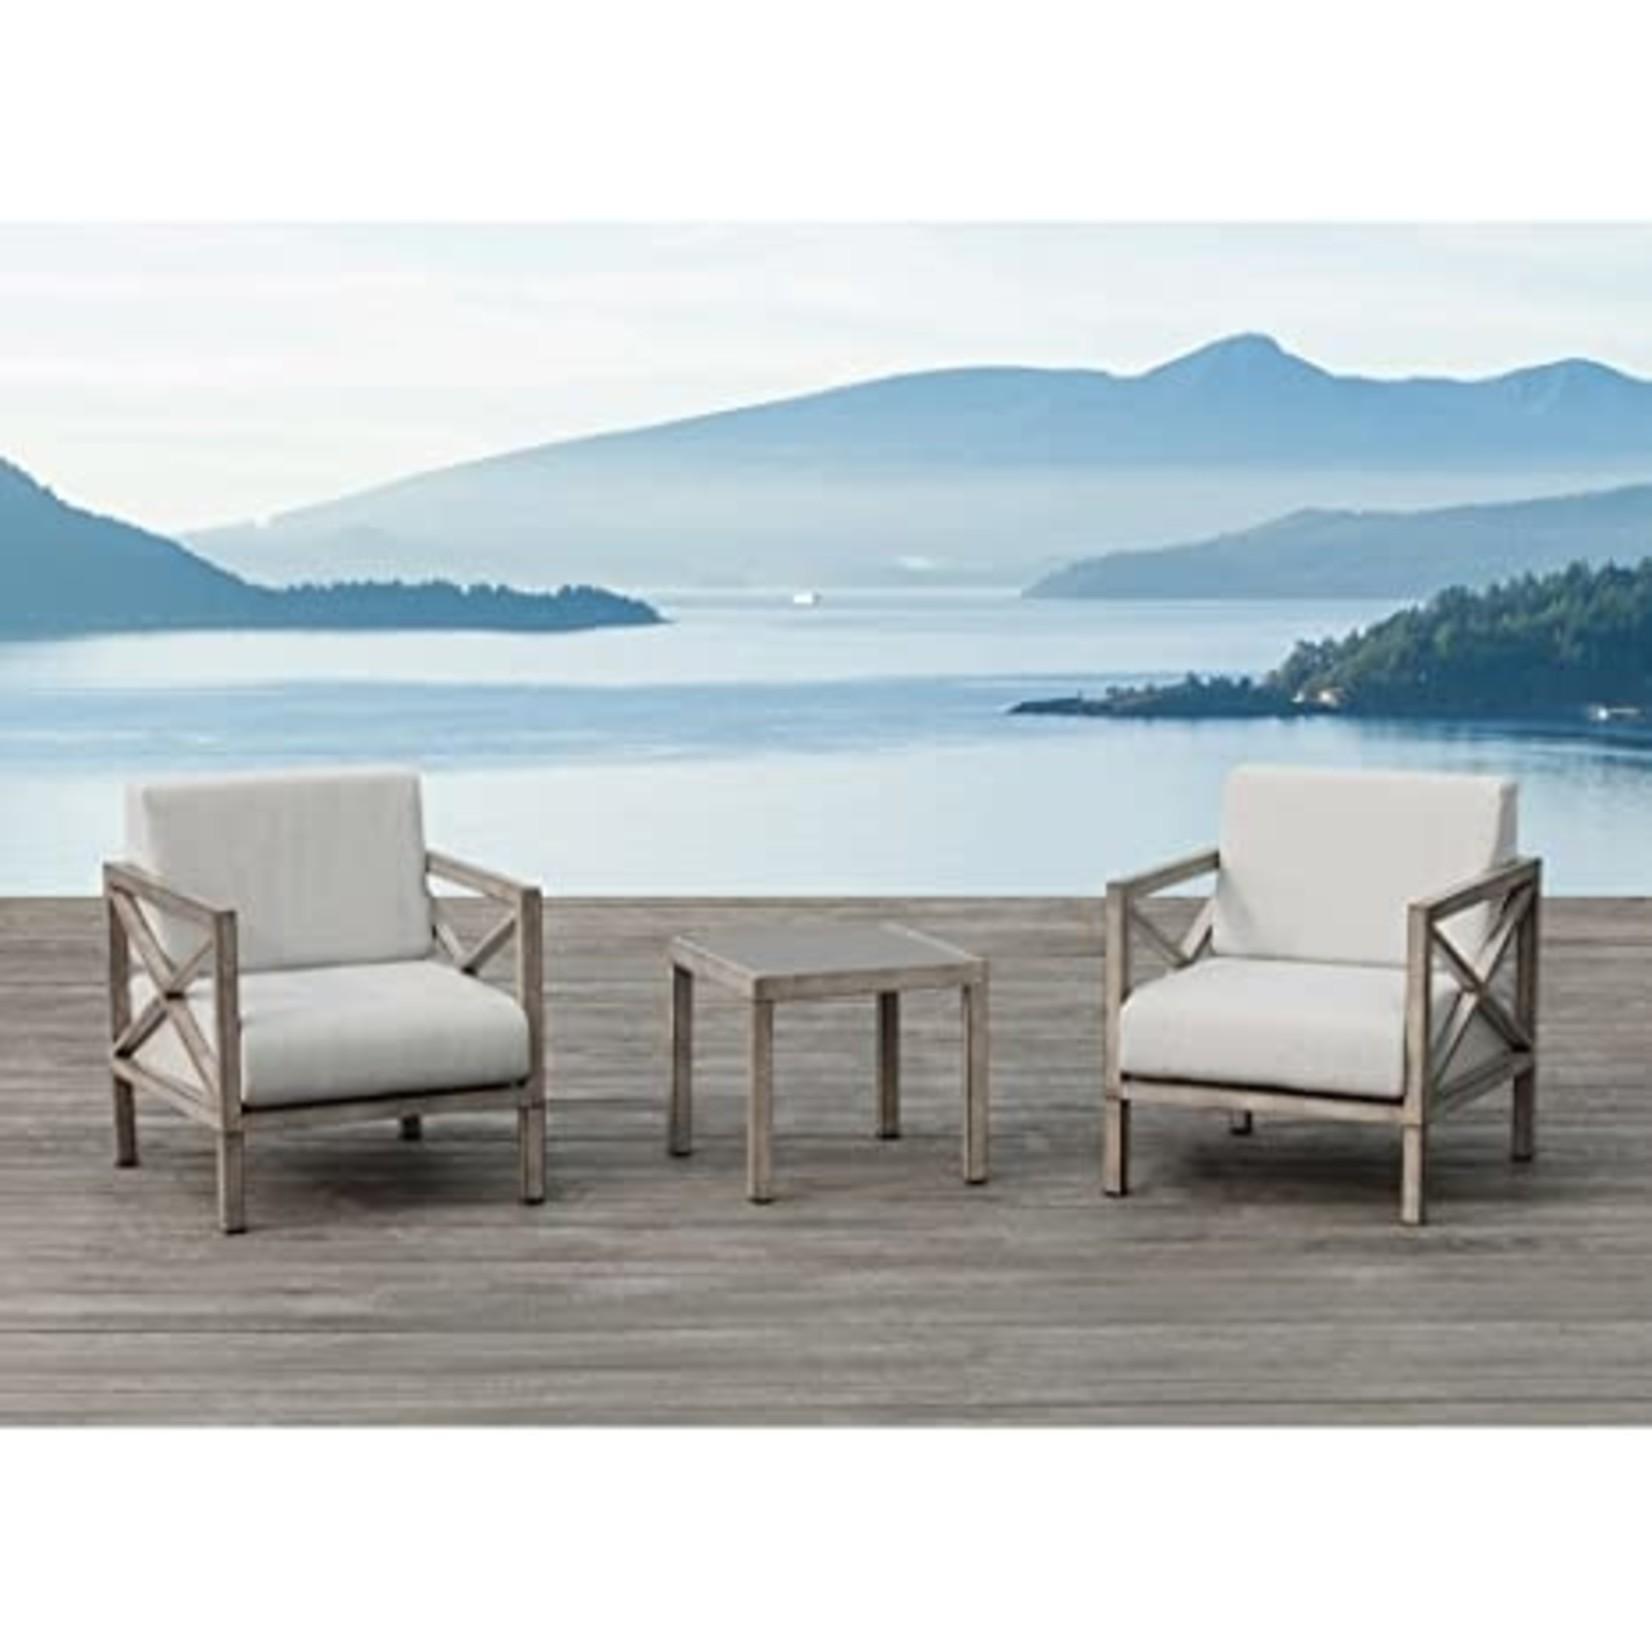 Patio Pasadena 3 mxc alum / sunbrella Ove (Chairs only 2)